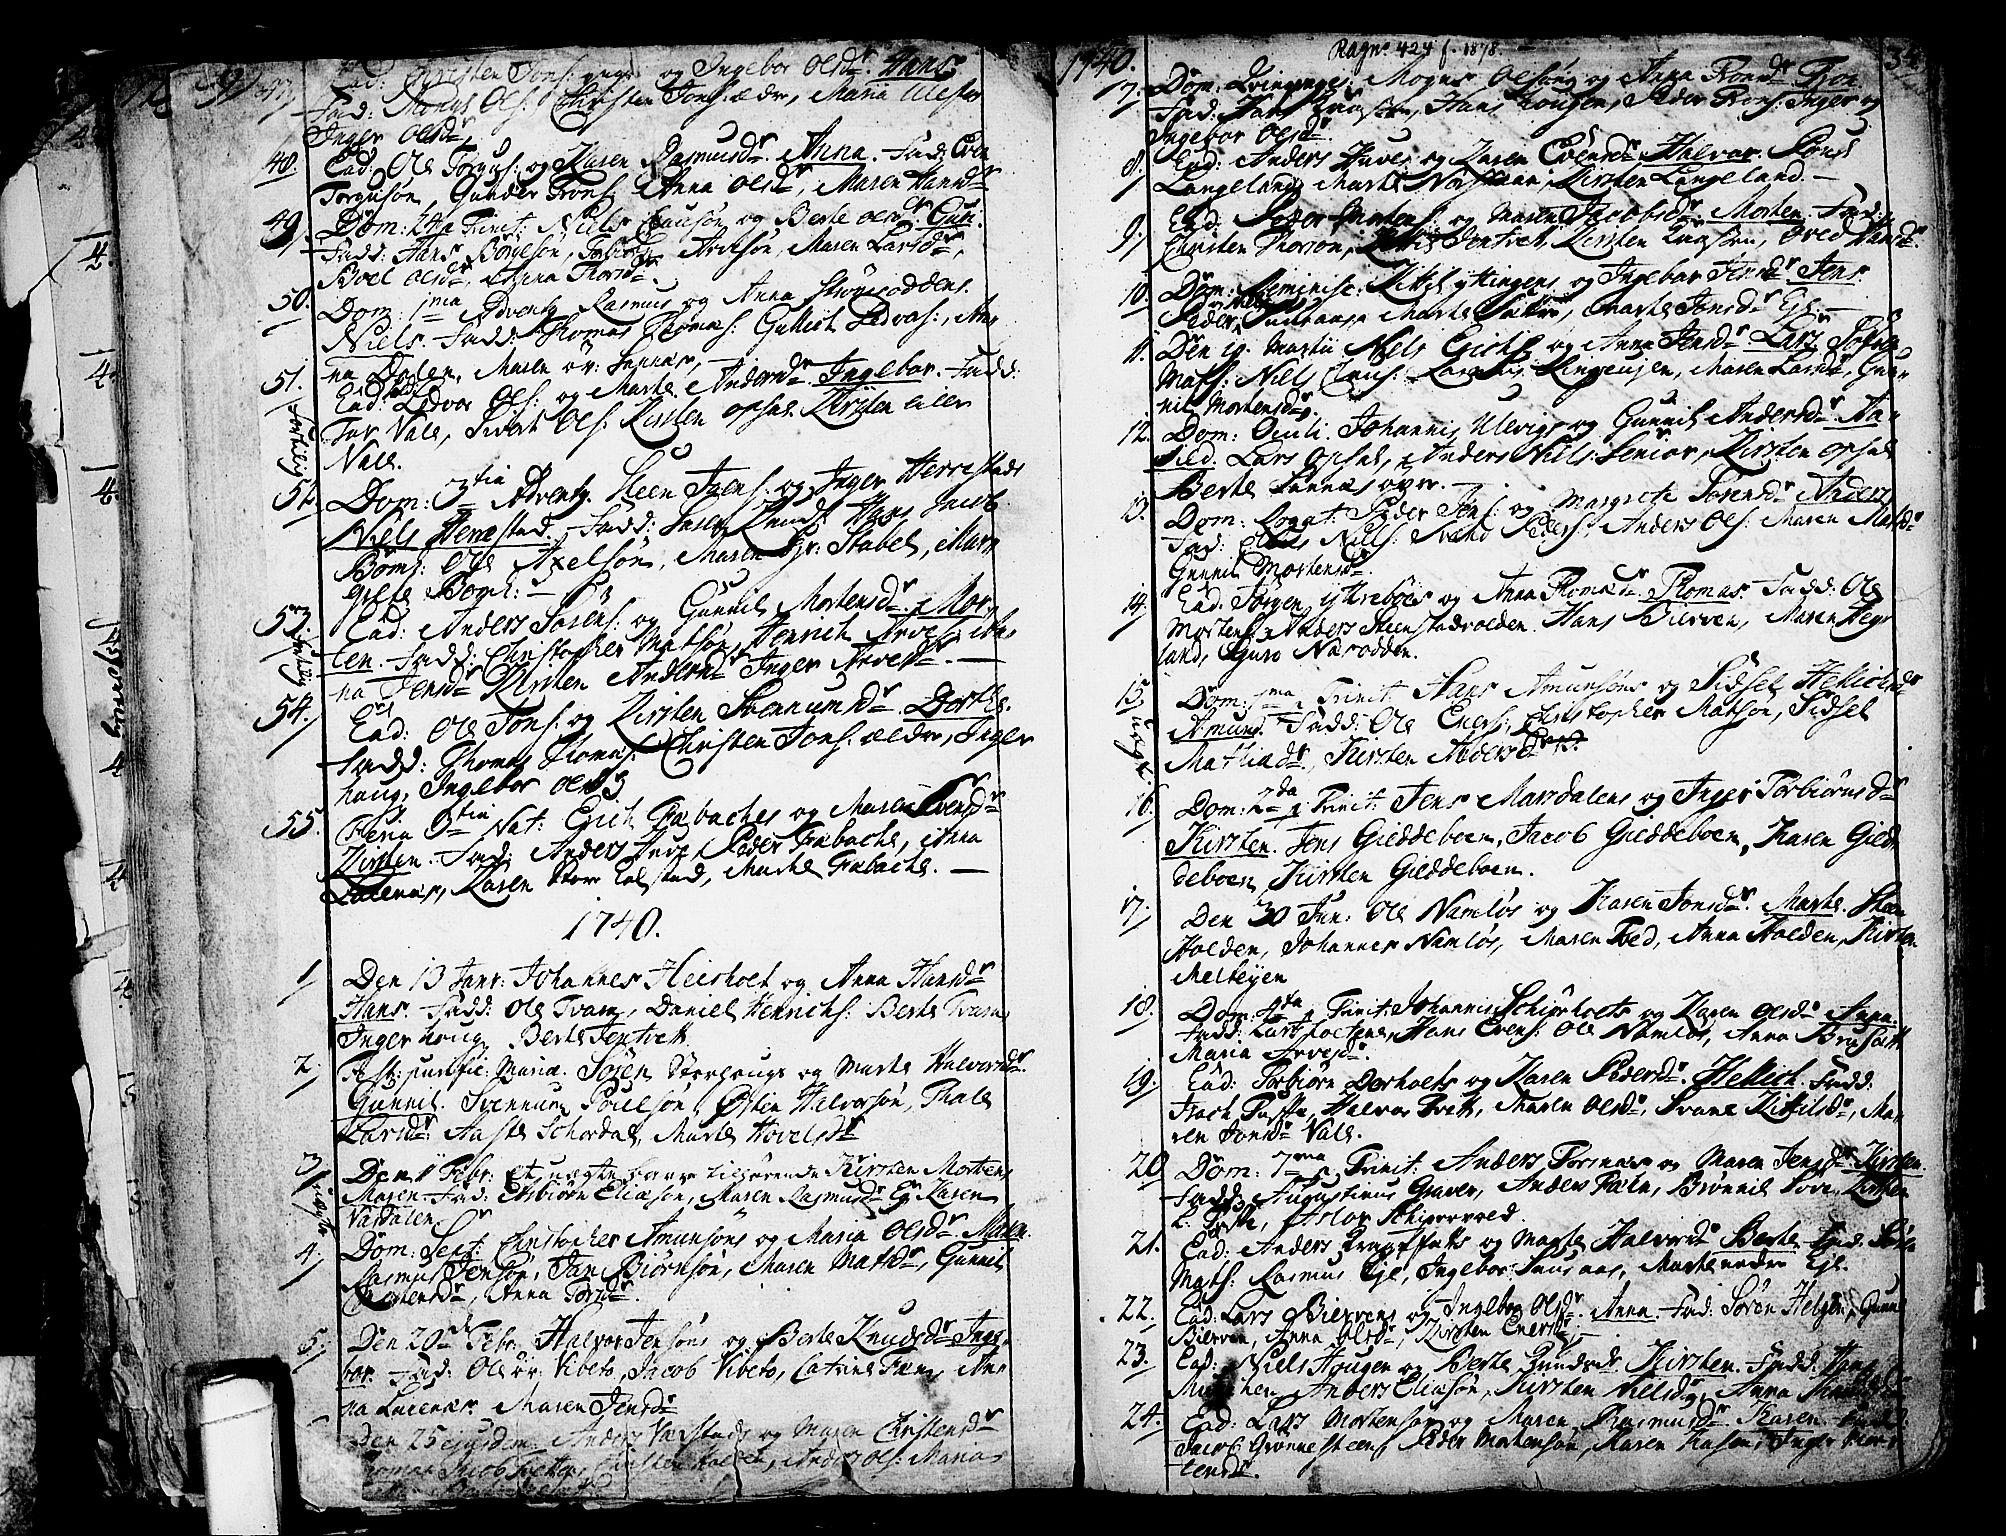 SAKO, Holla kirkebøker, F/Fa/L0001: Ministerialbok nr. 1, 1717-1779, s. 34